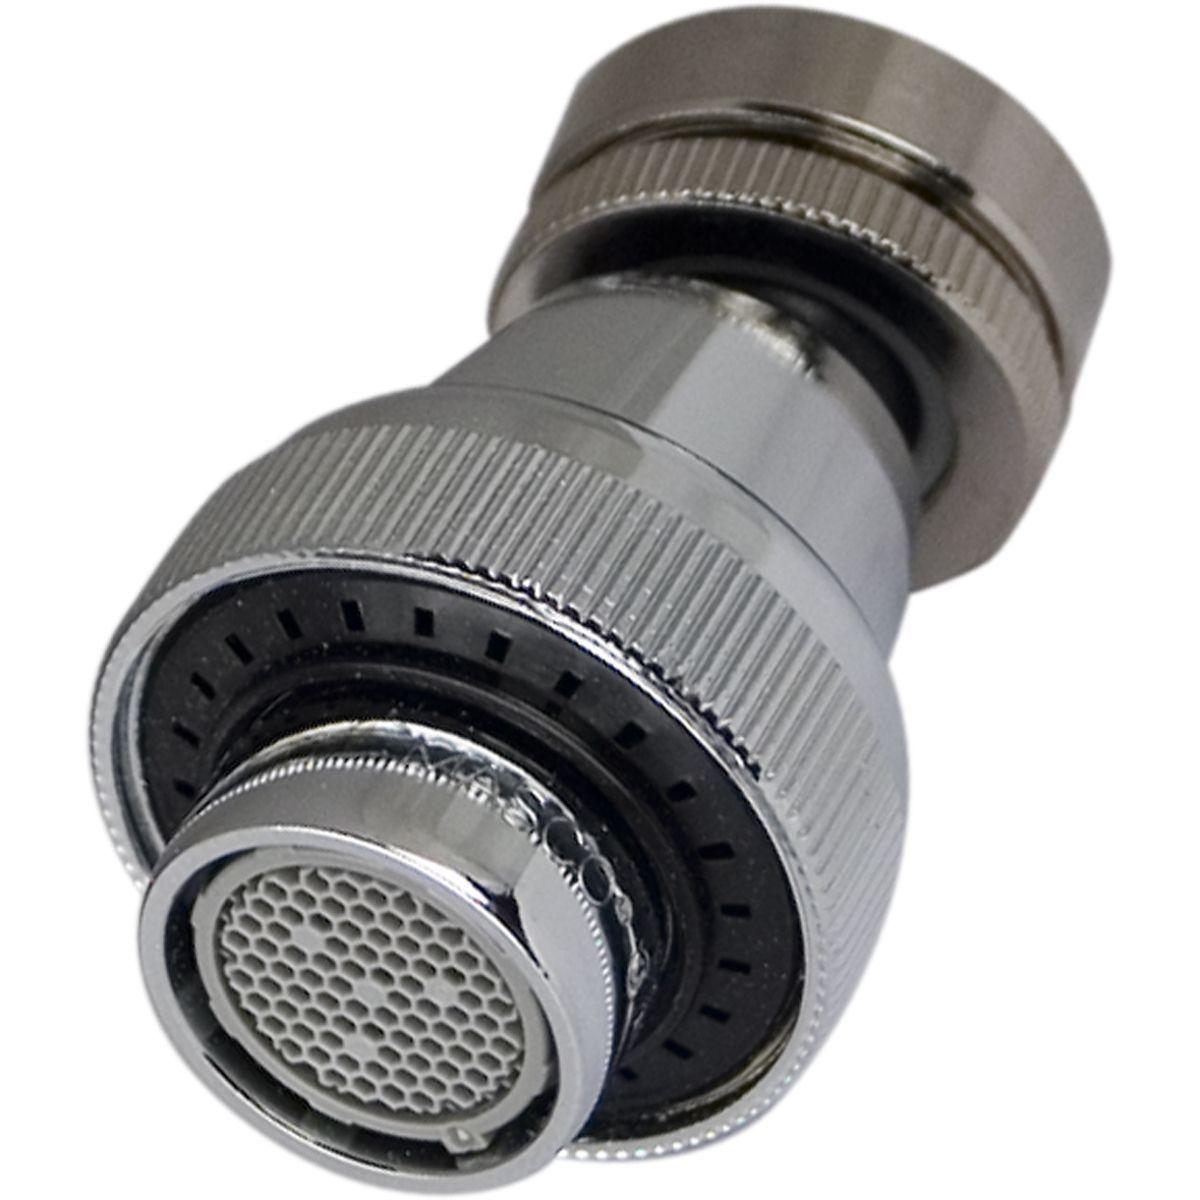 Delta Genuine Parts RP63137 Swivel Aerator